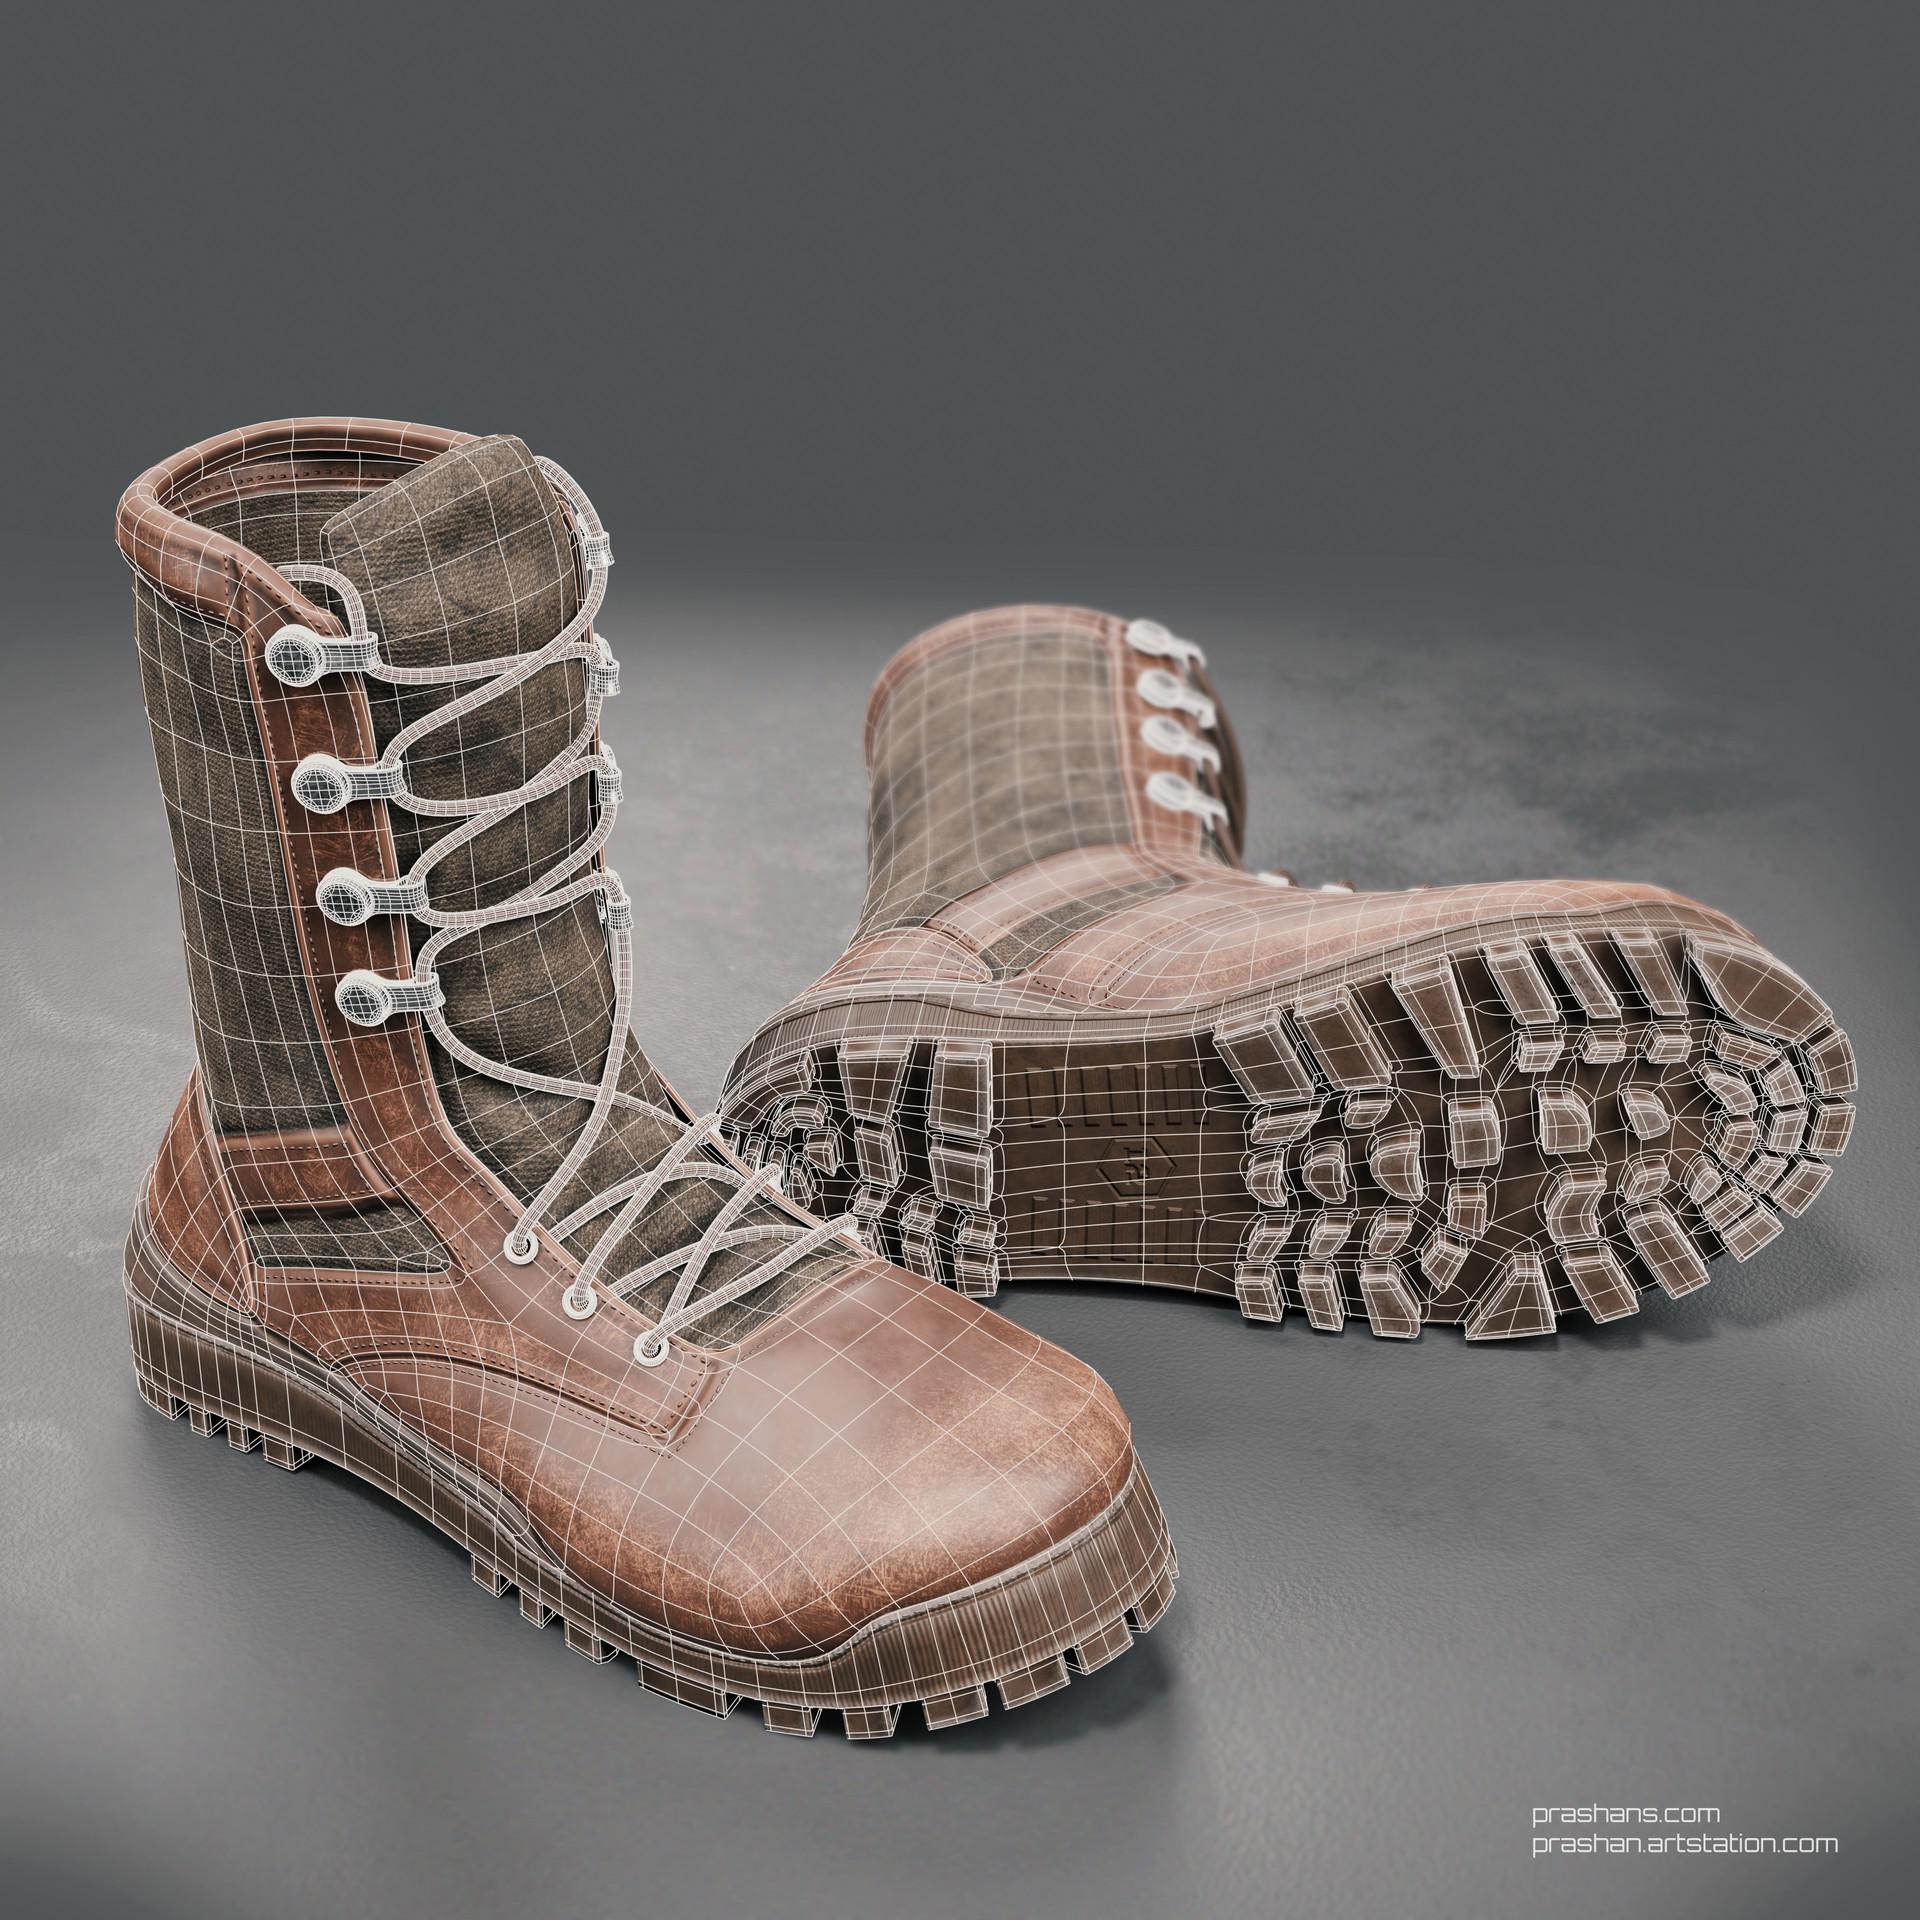 Prashan subasinghe boot 01e mesh